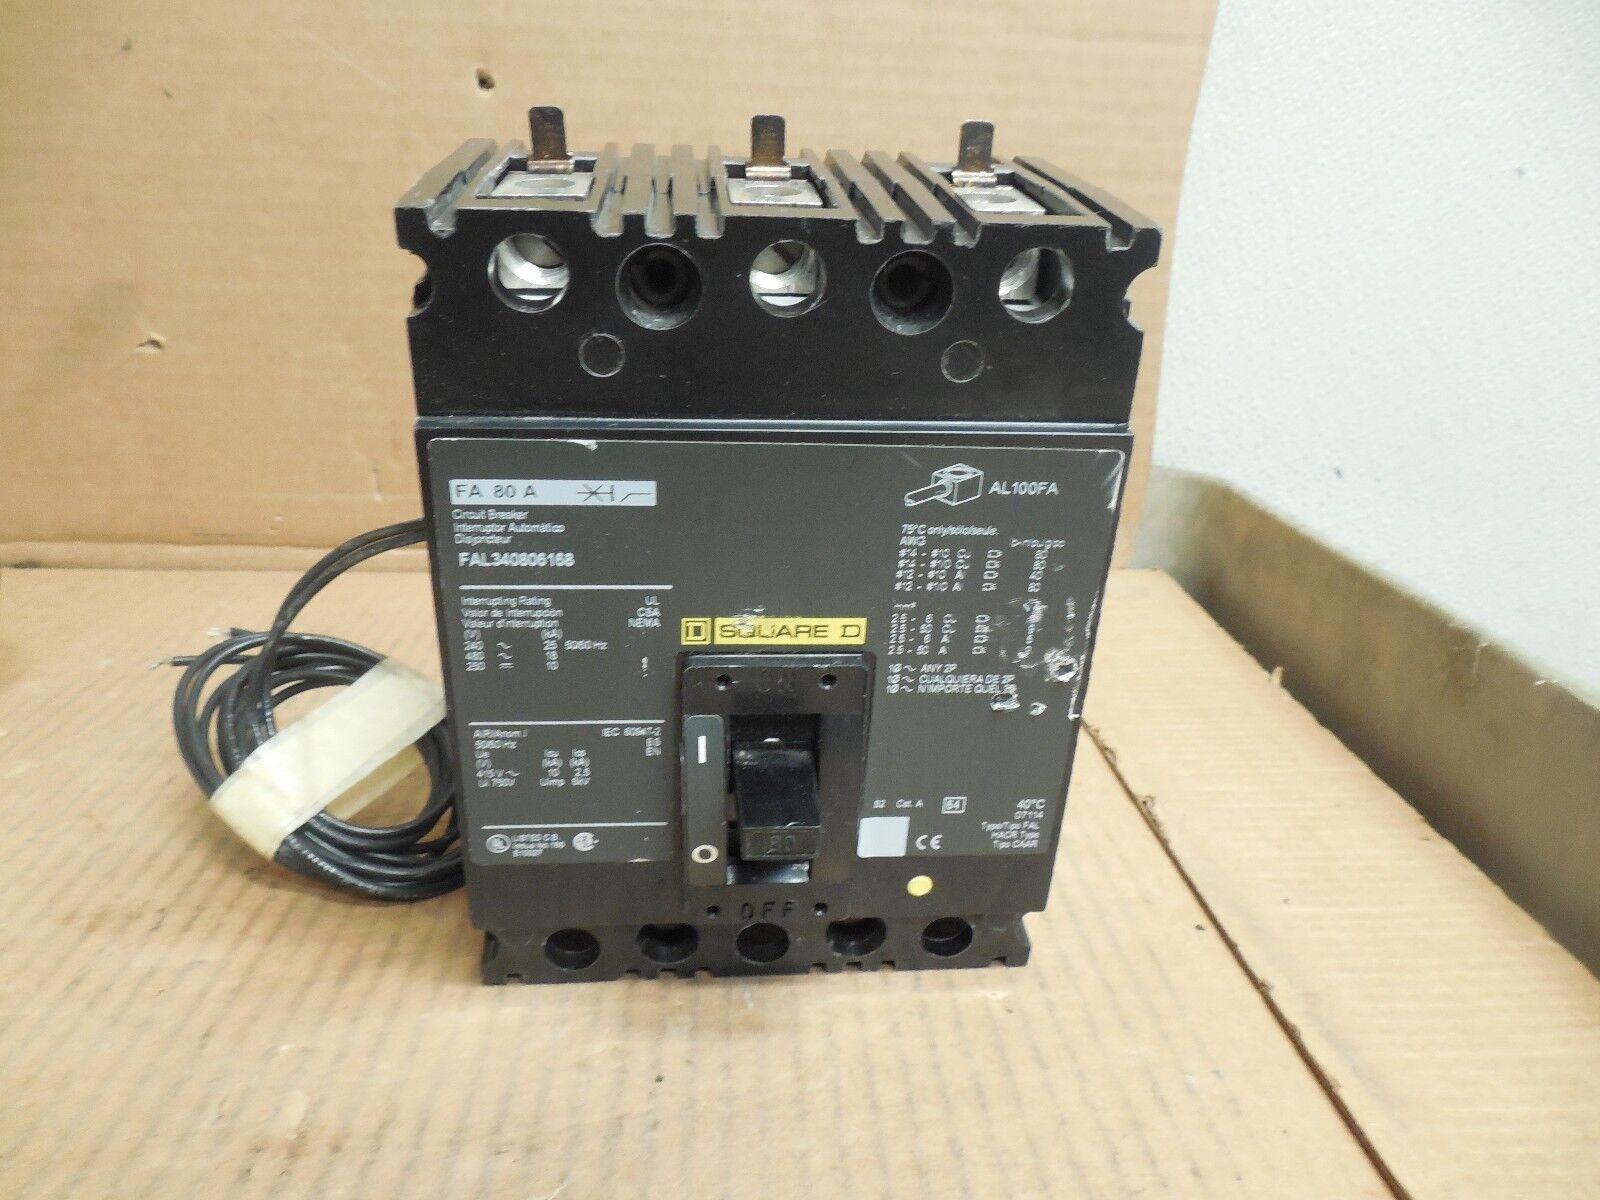 Laser Entfernungsmesser Keyence : New square d shunt breaker fal340806168 80 aa amp